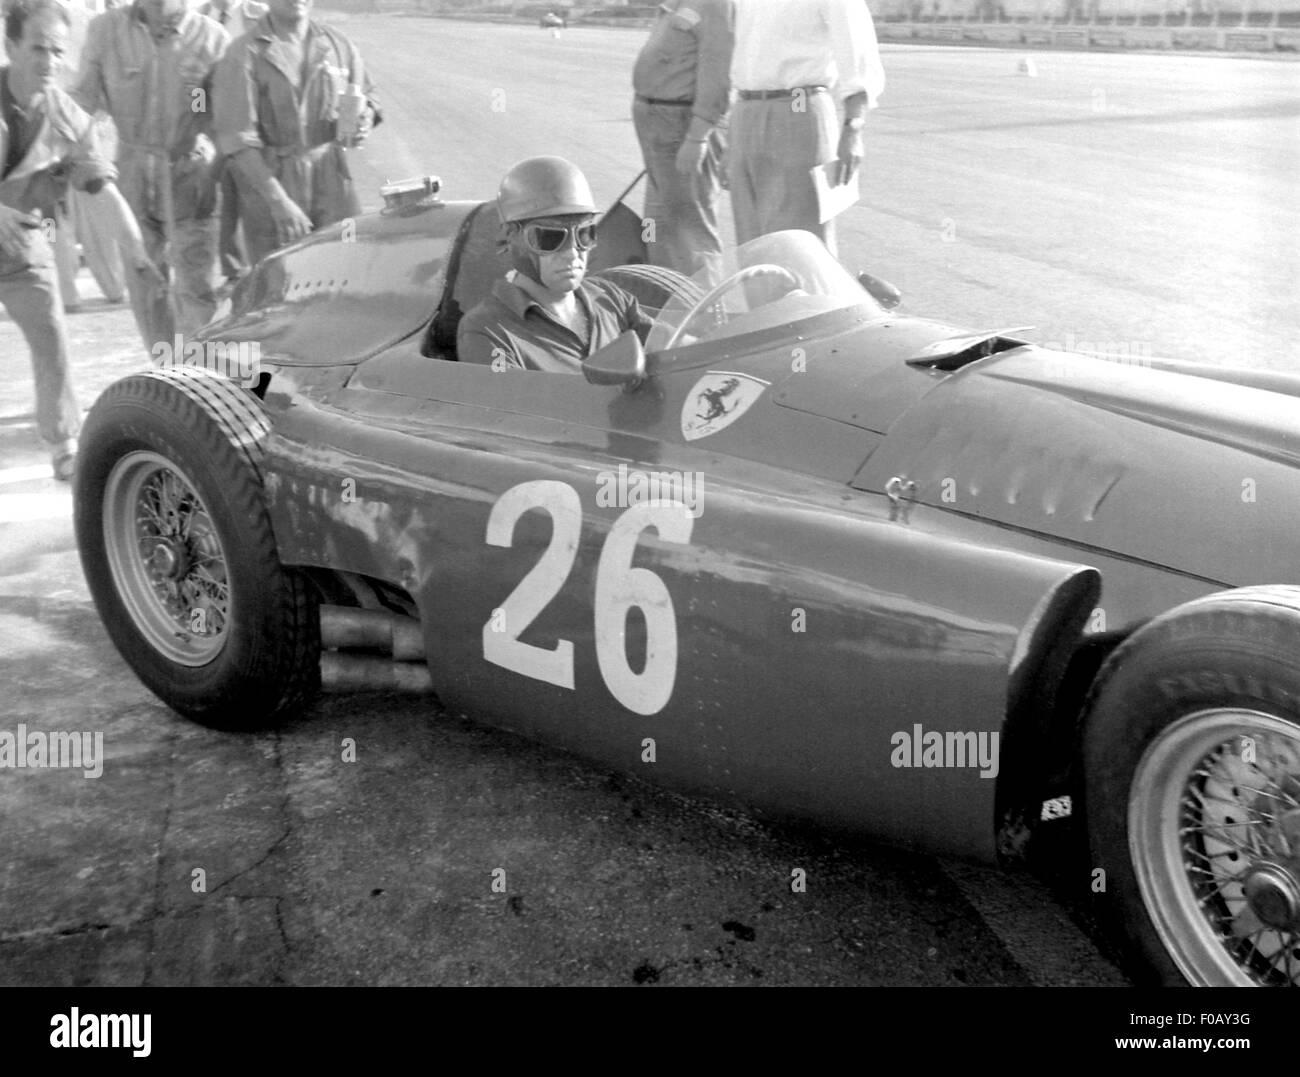 Italian GP in Monza 1956 Stock Photo